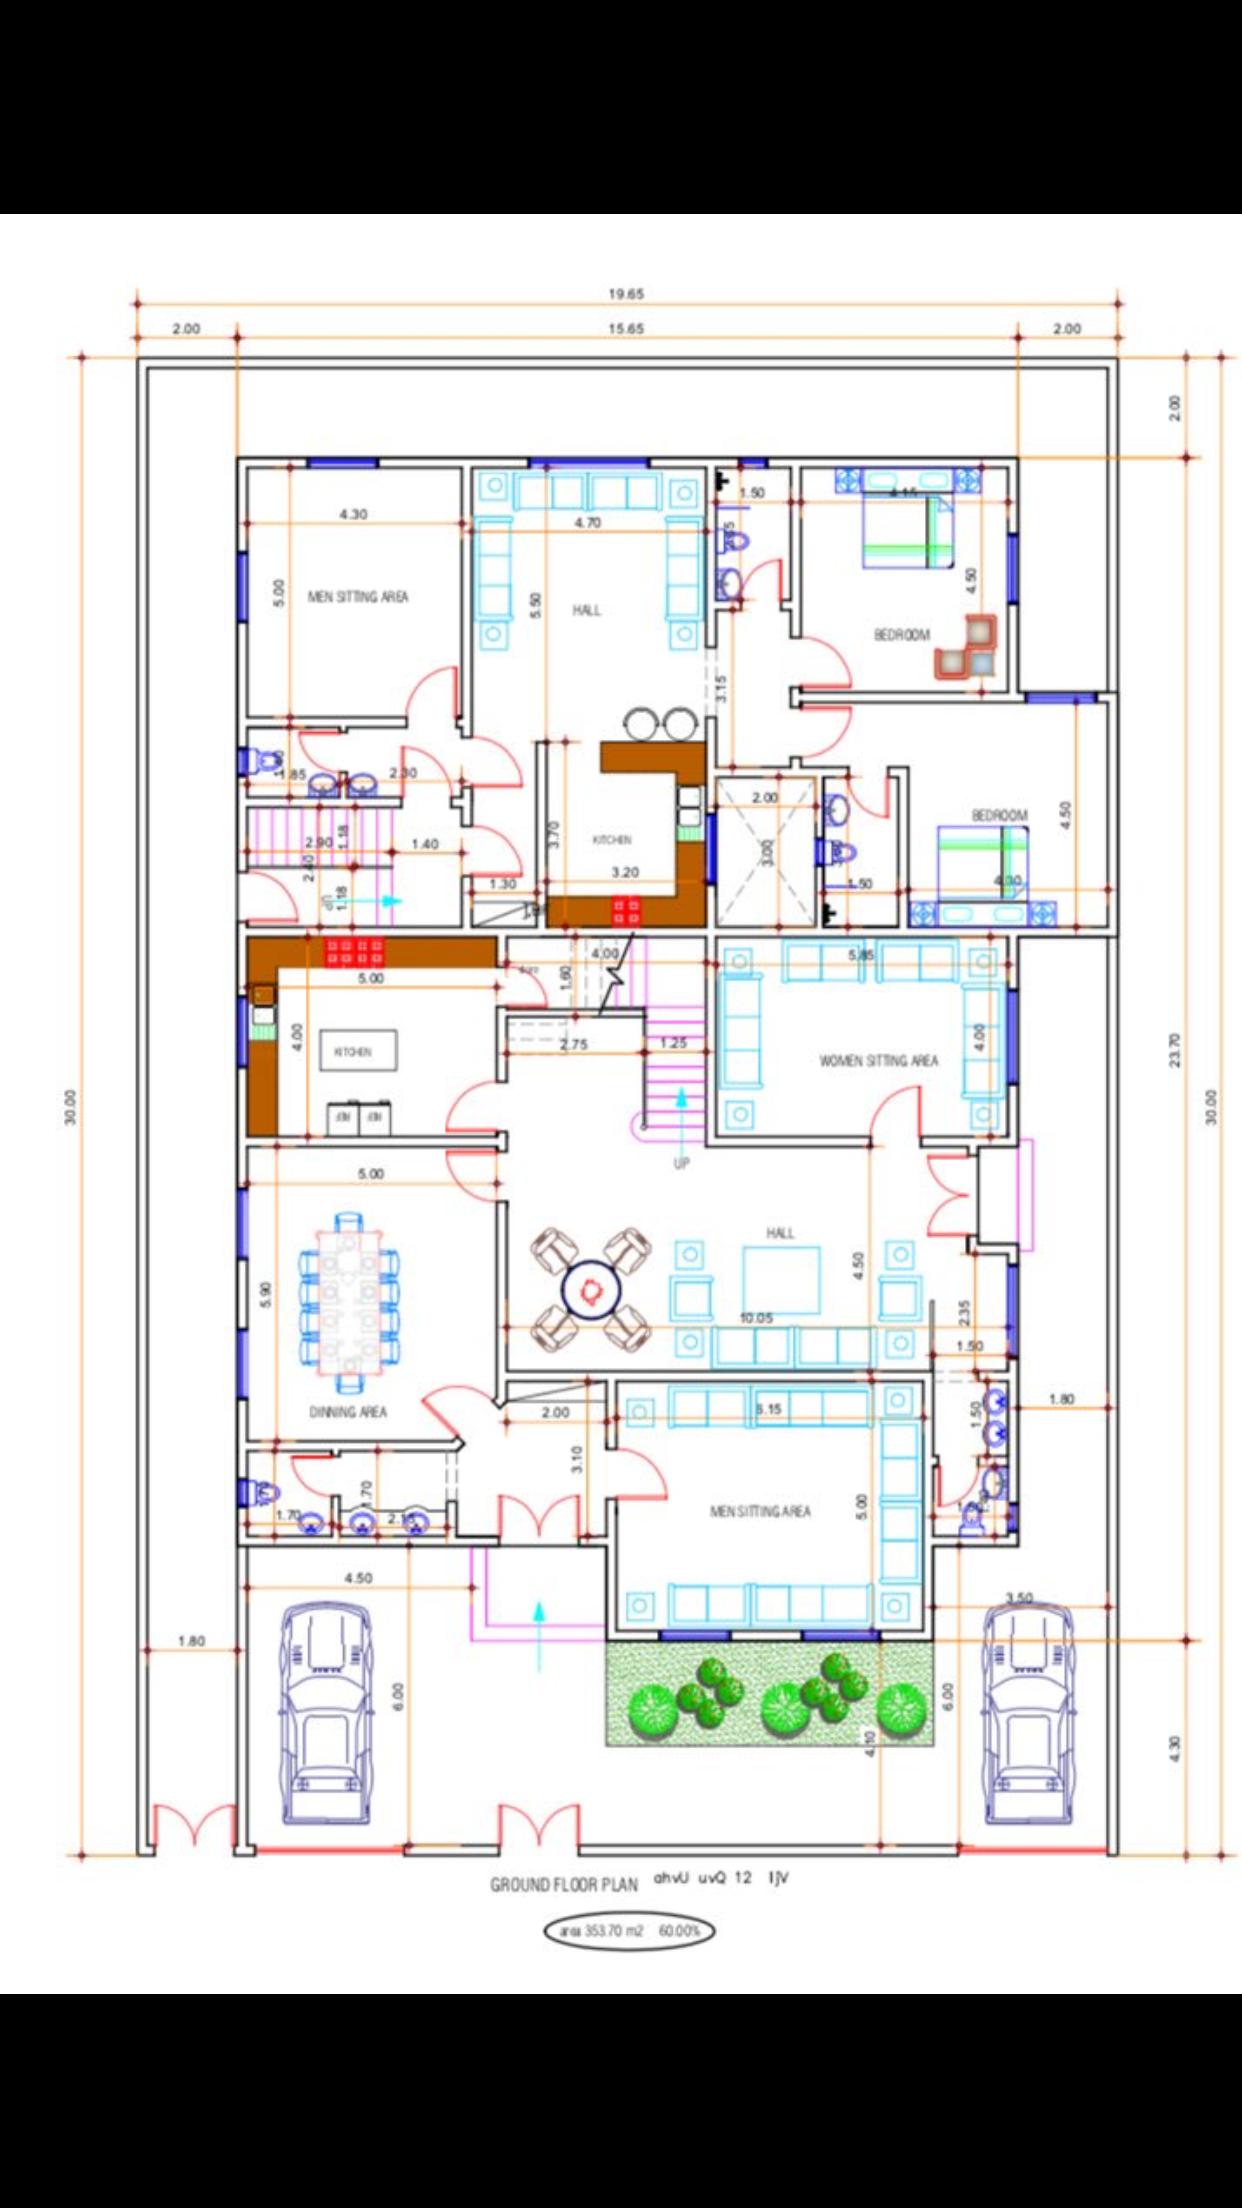 Pin By ماهر المزروعي On تصاميم Ground Floor Plan Apartment Floor Plans New House Plans